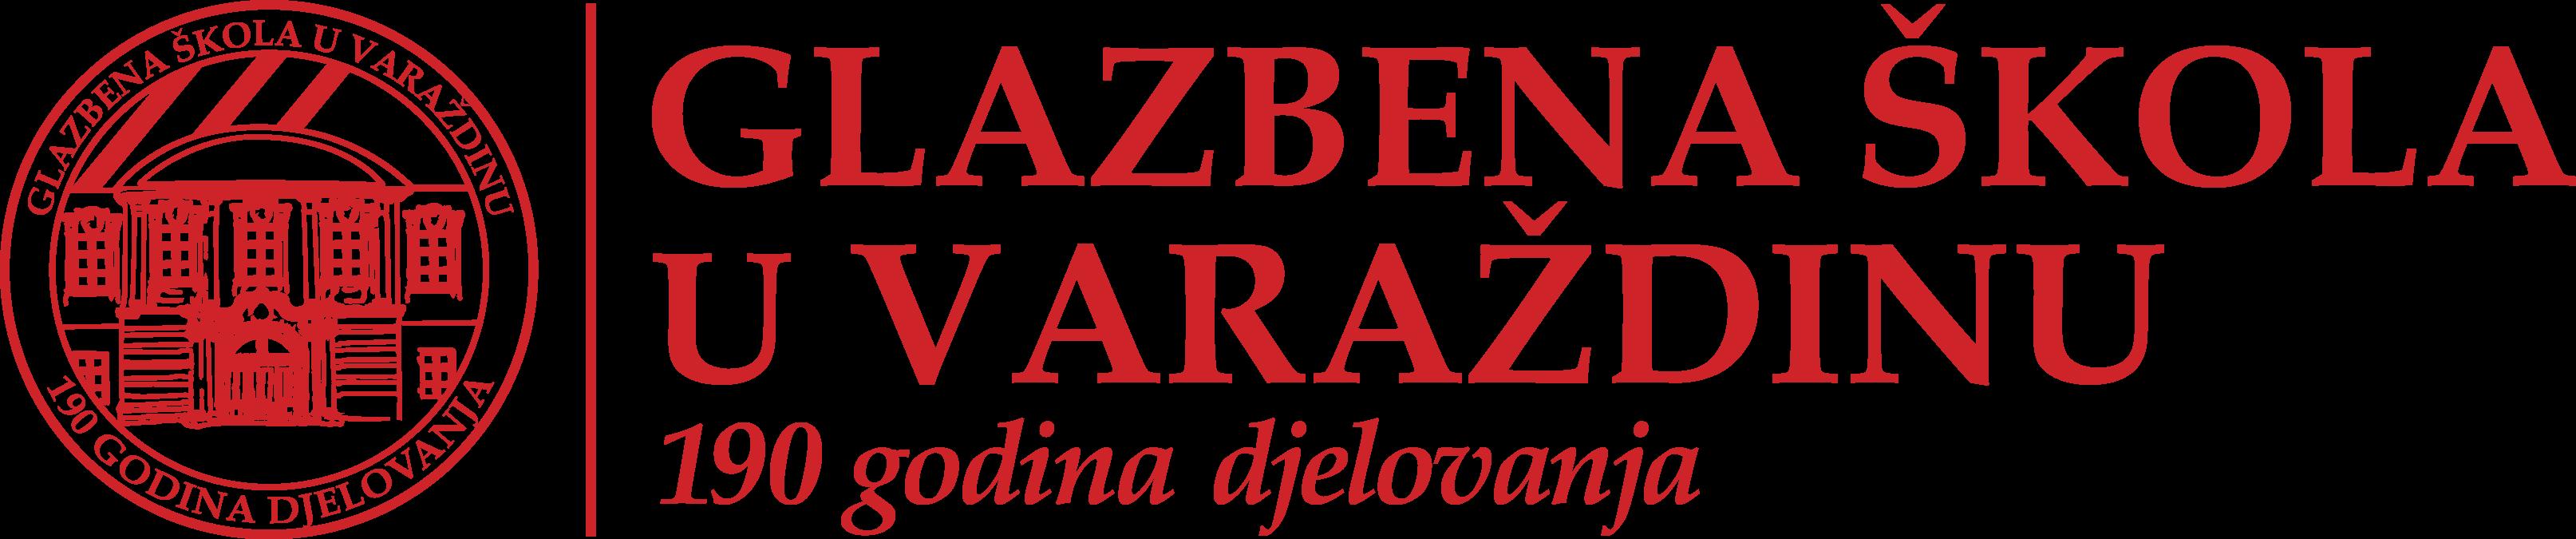 LOGOTIP-GLAZBENA-SLUŽBENI-crveni-web-2